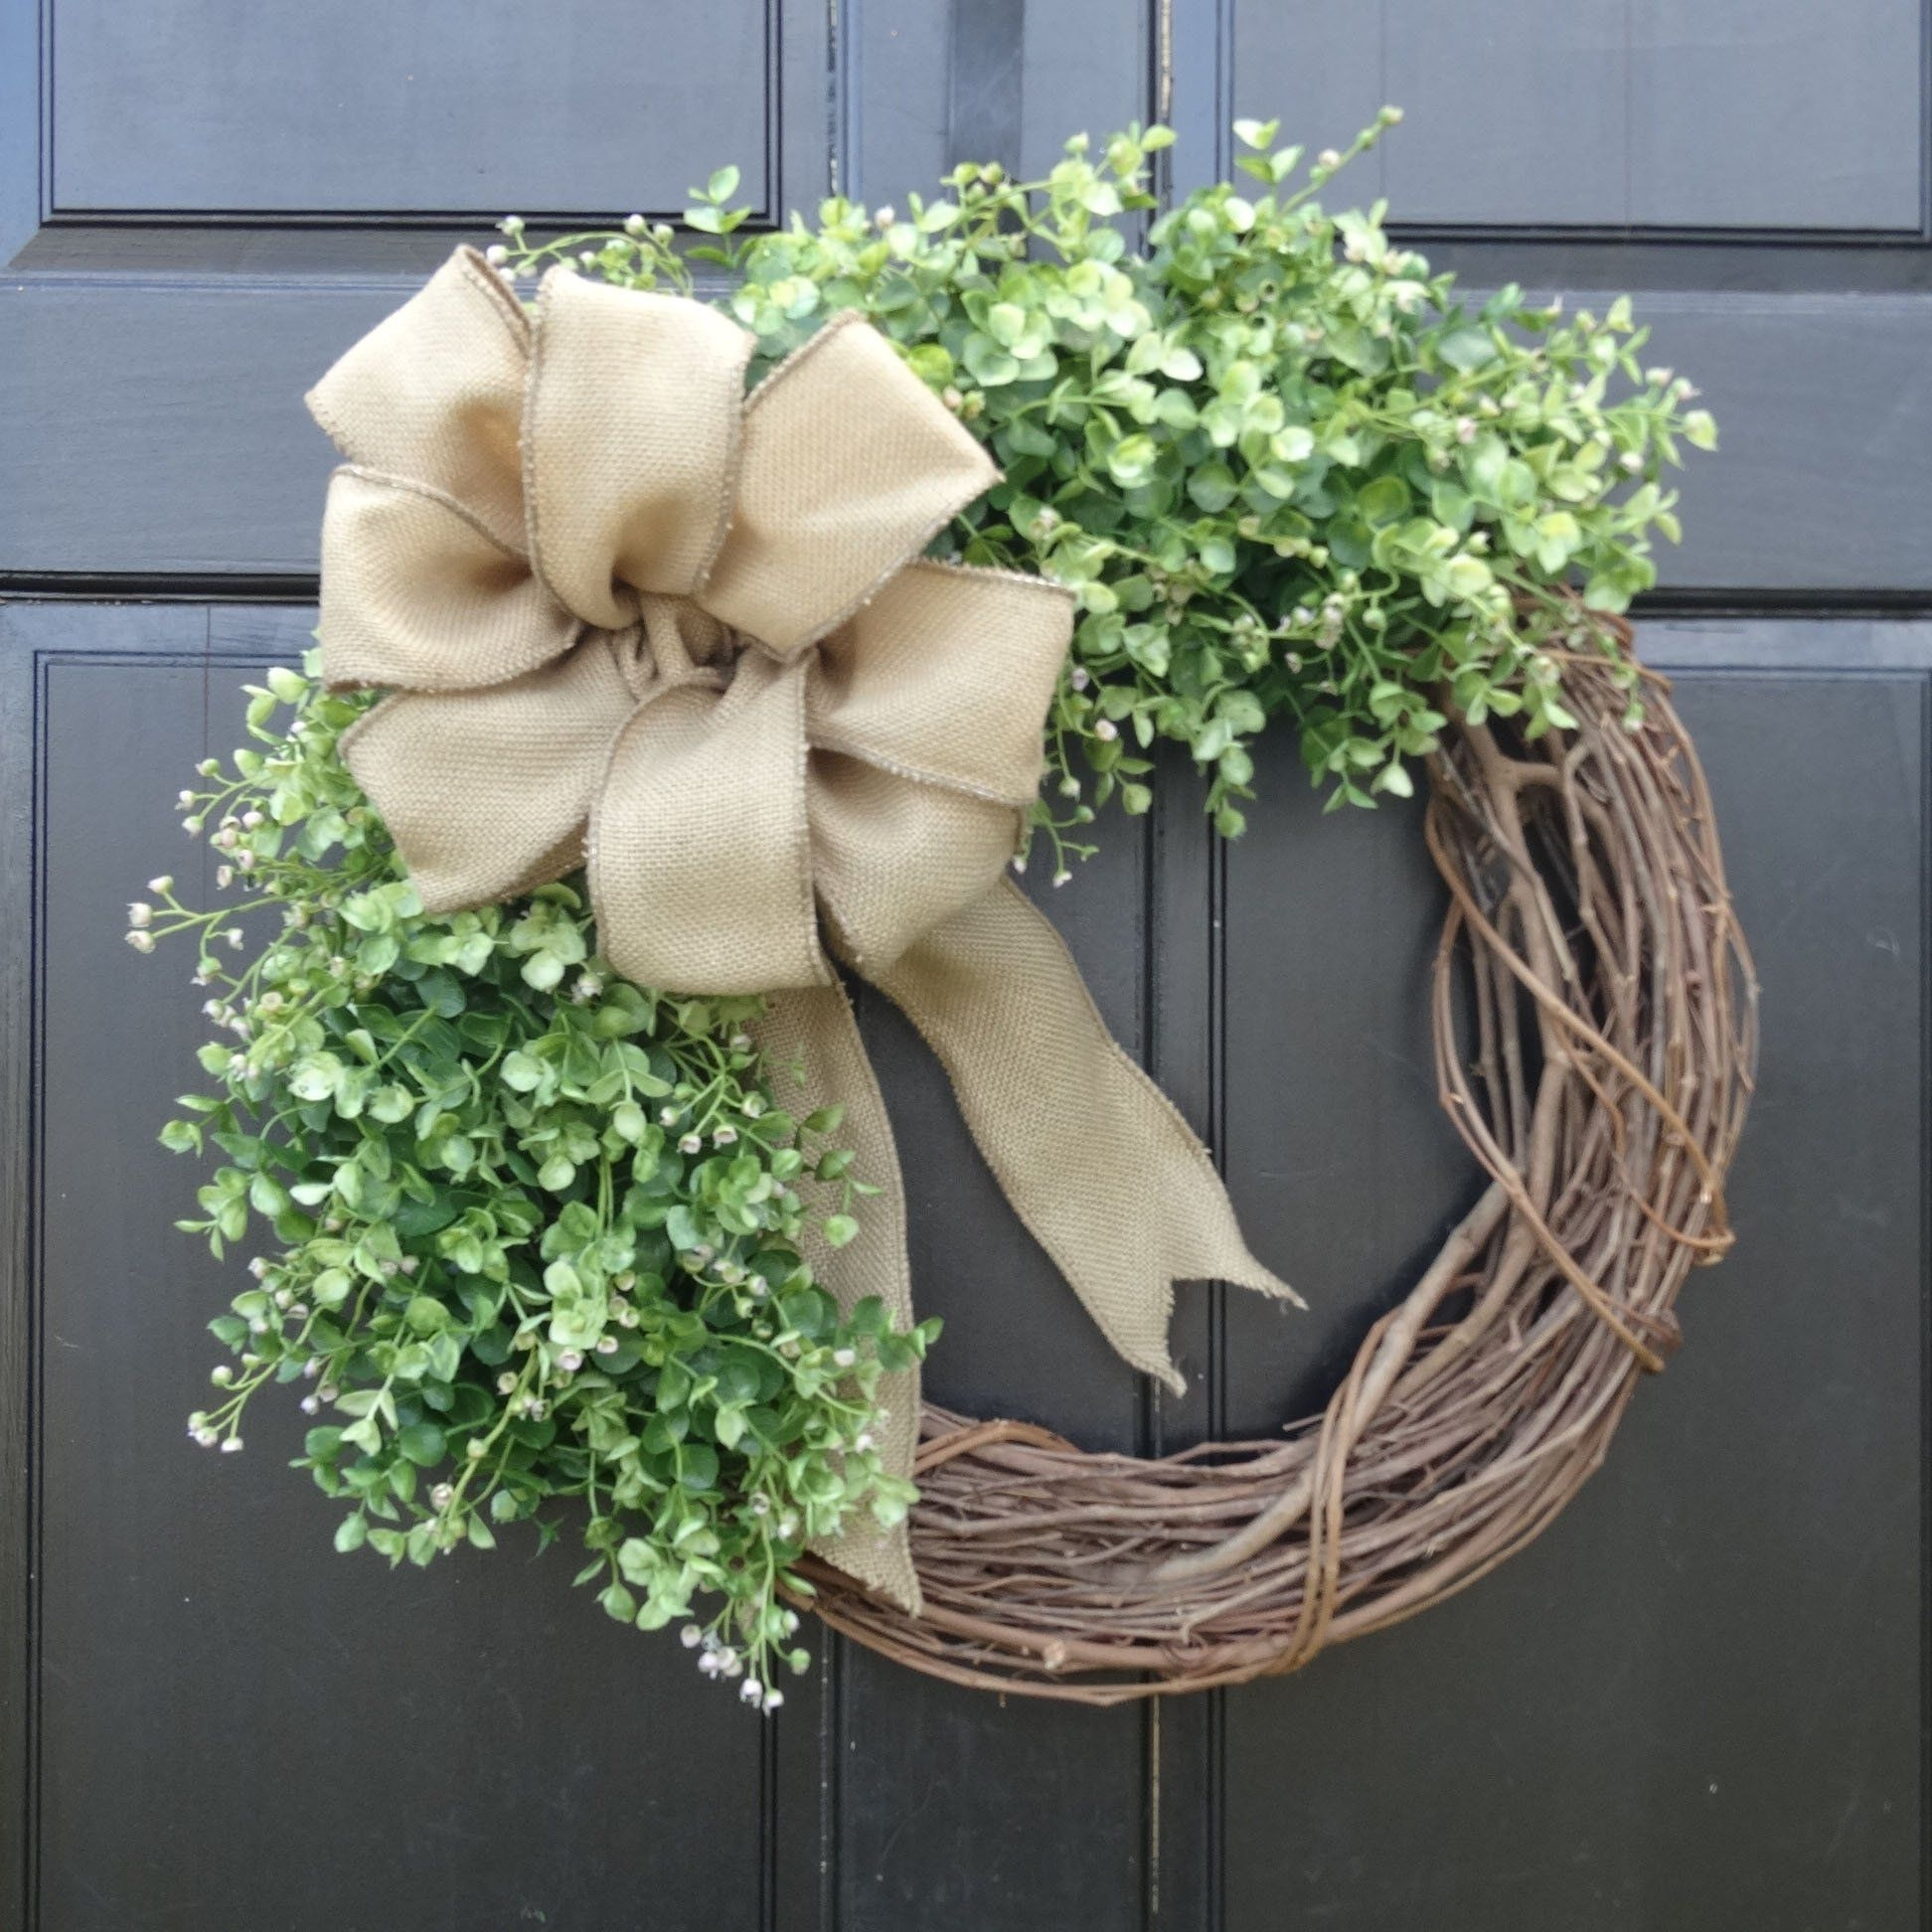 Lovely Farmhouse Christmas Porch Decor And Design Ideas 38